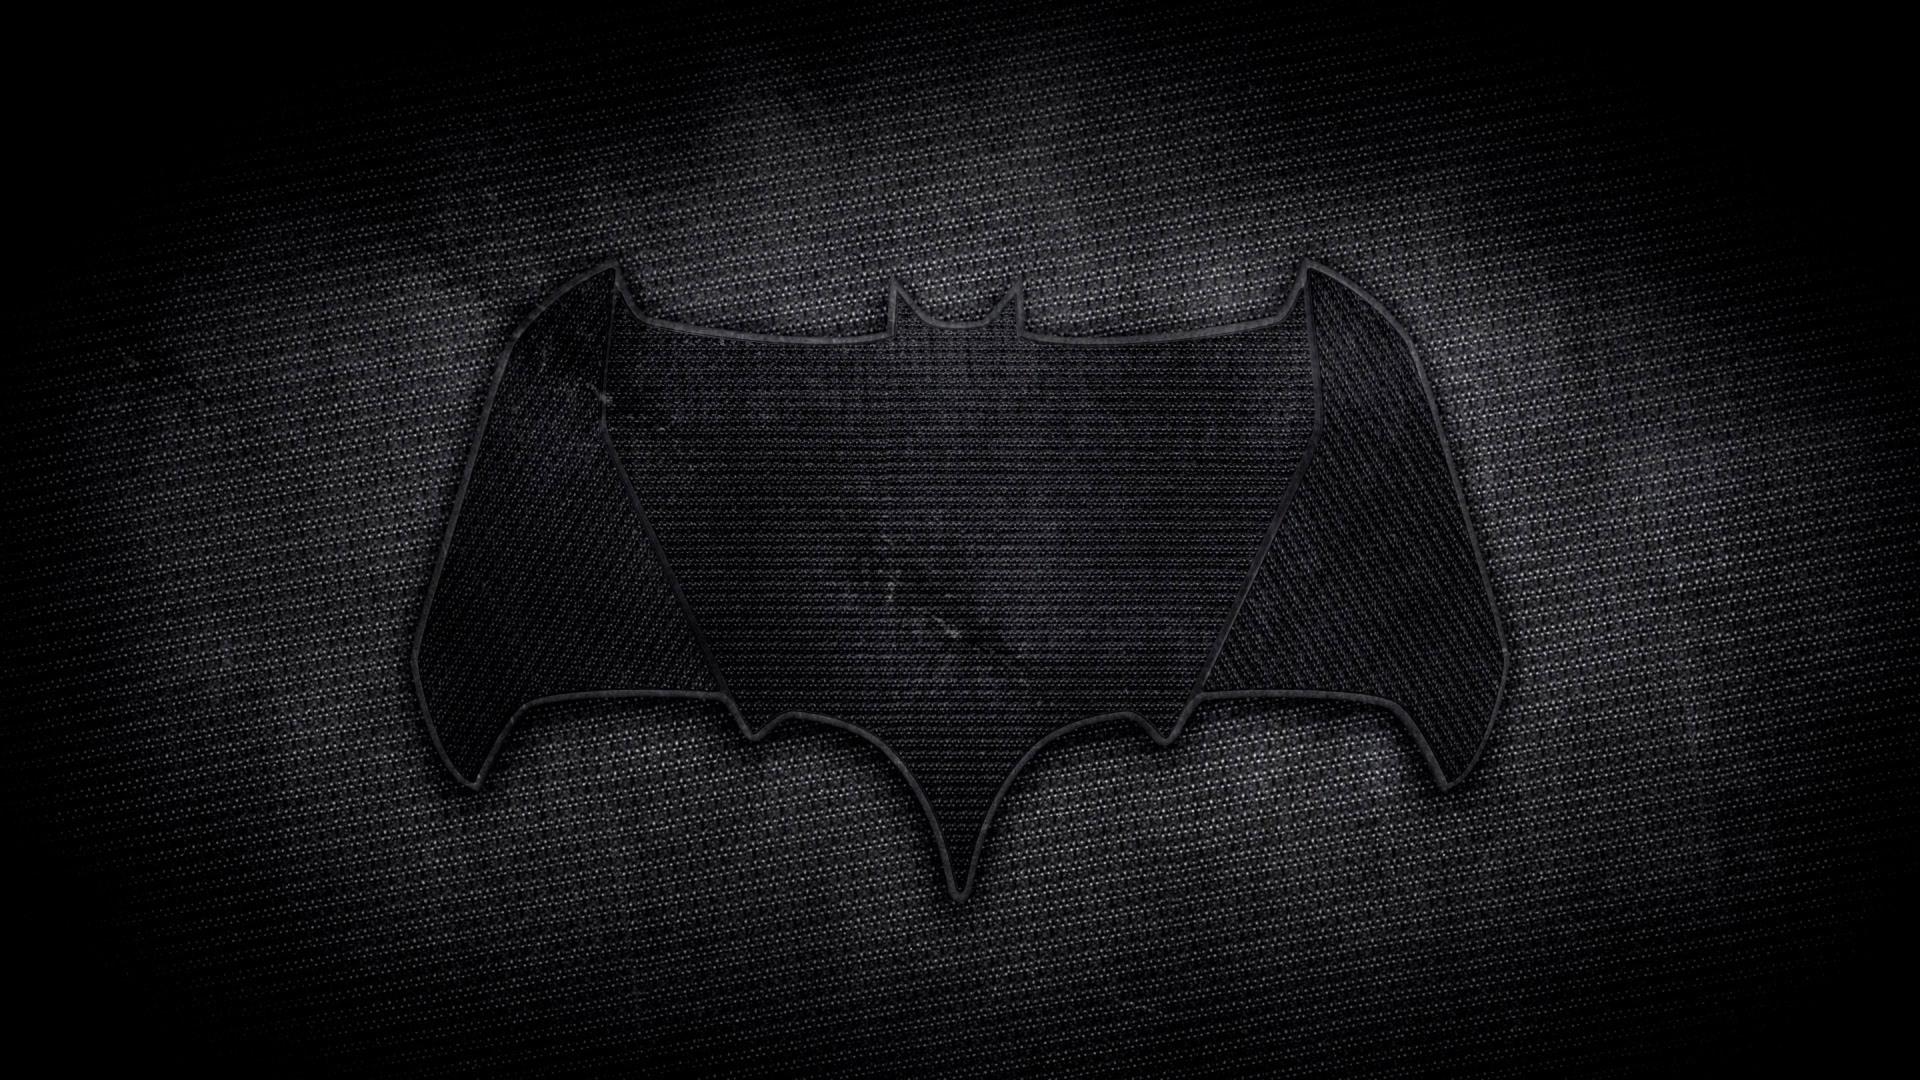 batman-dark-leather-logo-pic.jpg